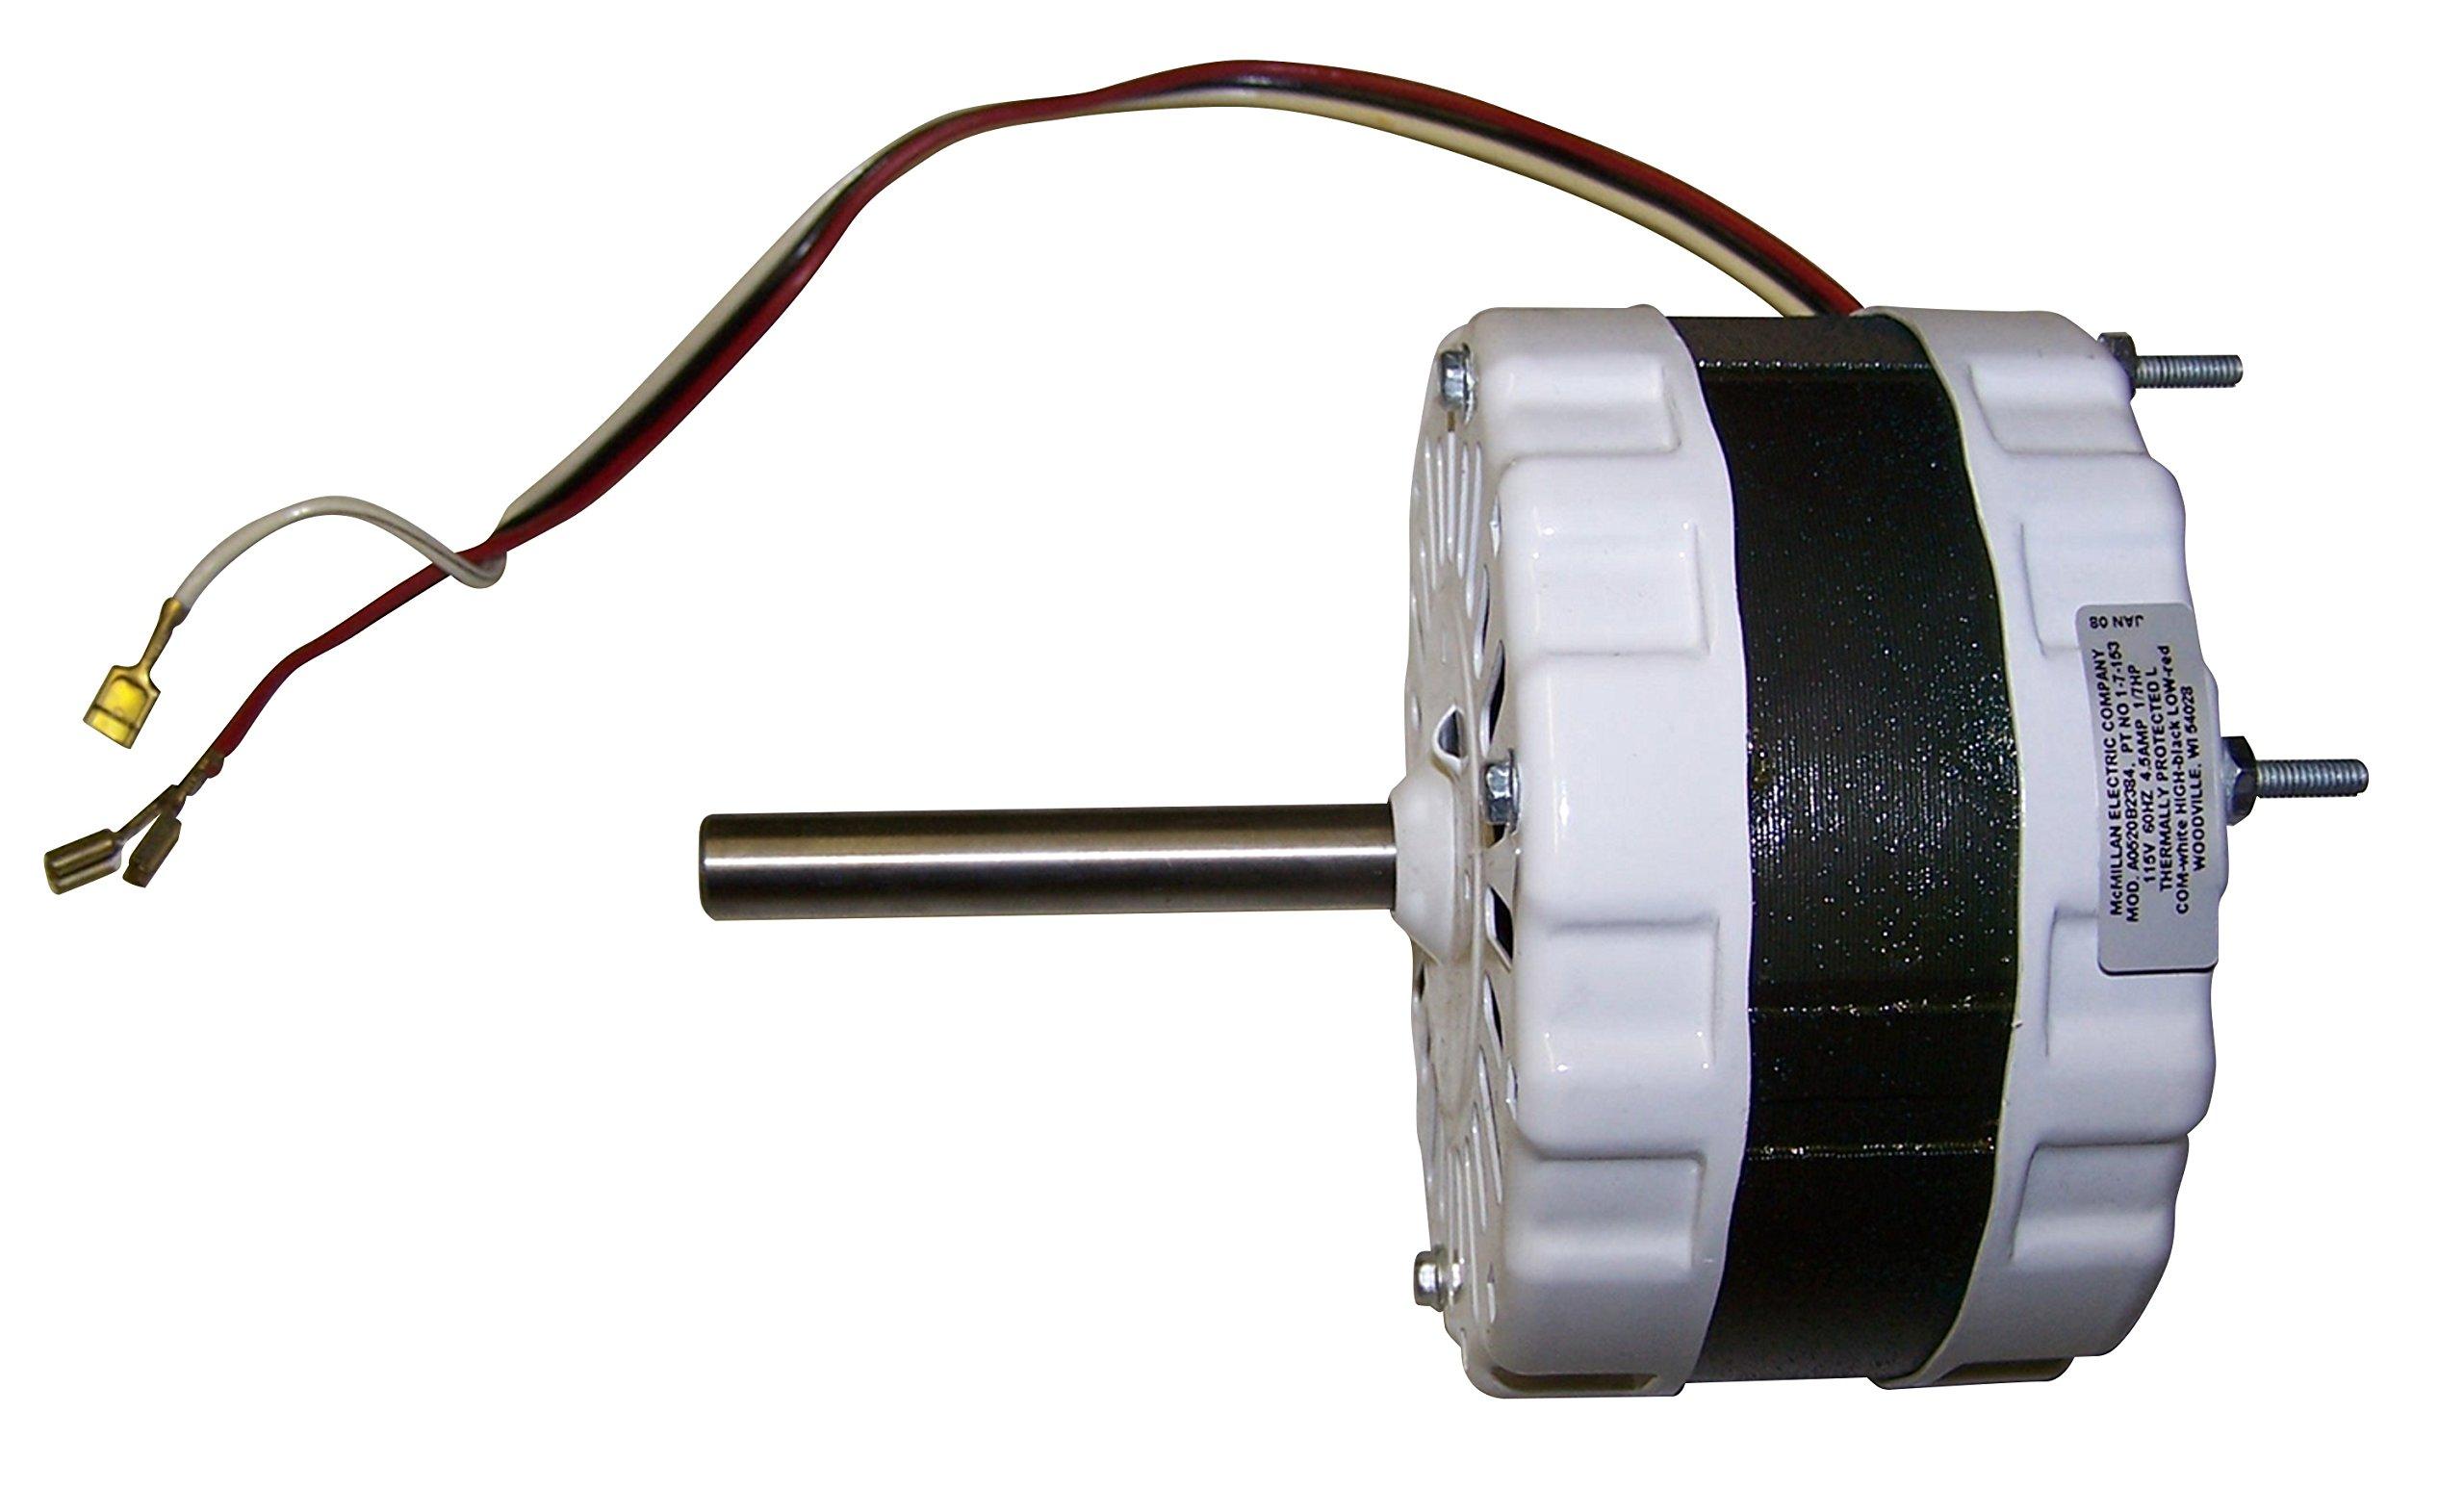 Phoenix Manufacturing 05-007-0035 1/8 HP Evaporative Cooler Motor, 2-Speed, 120-Volt